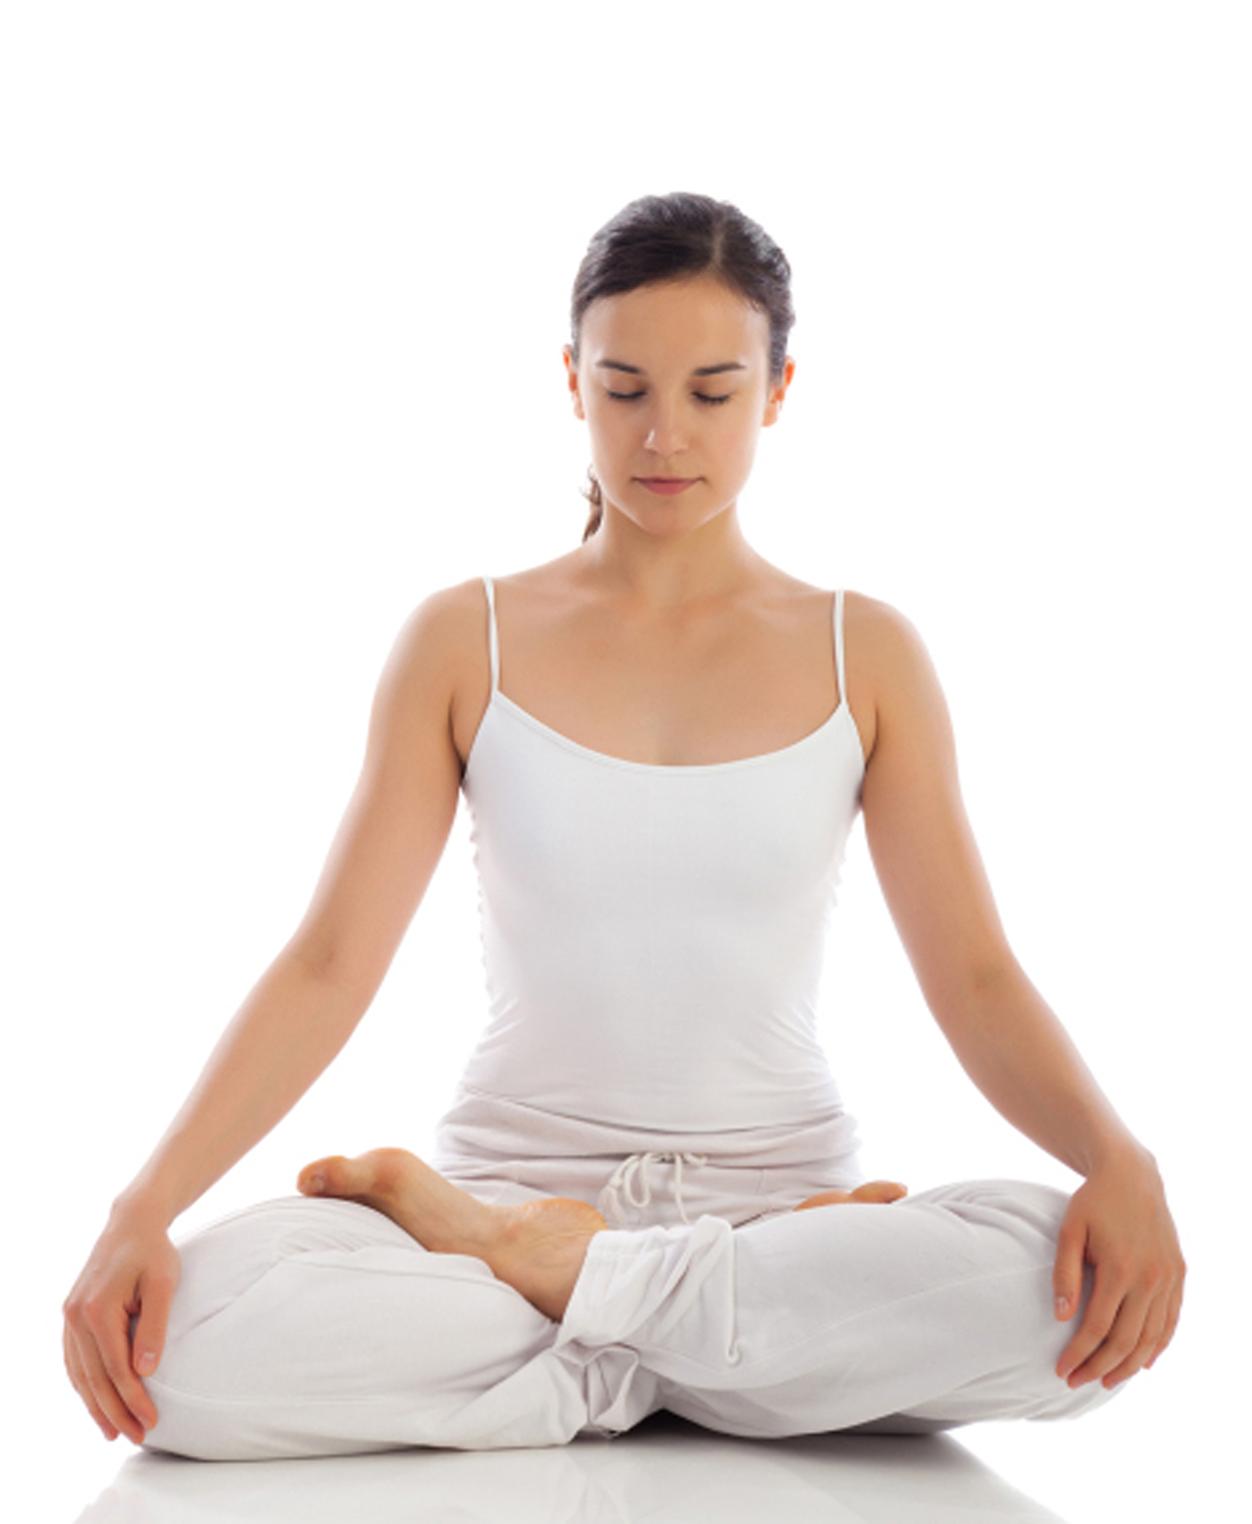 Yoga Meditation Pose STRESS RELIEF -...